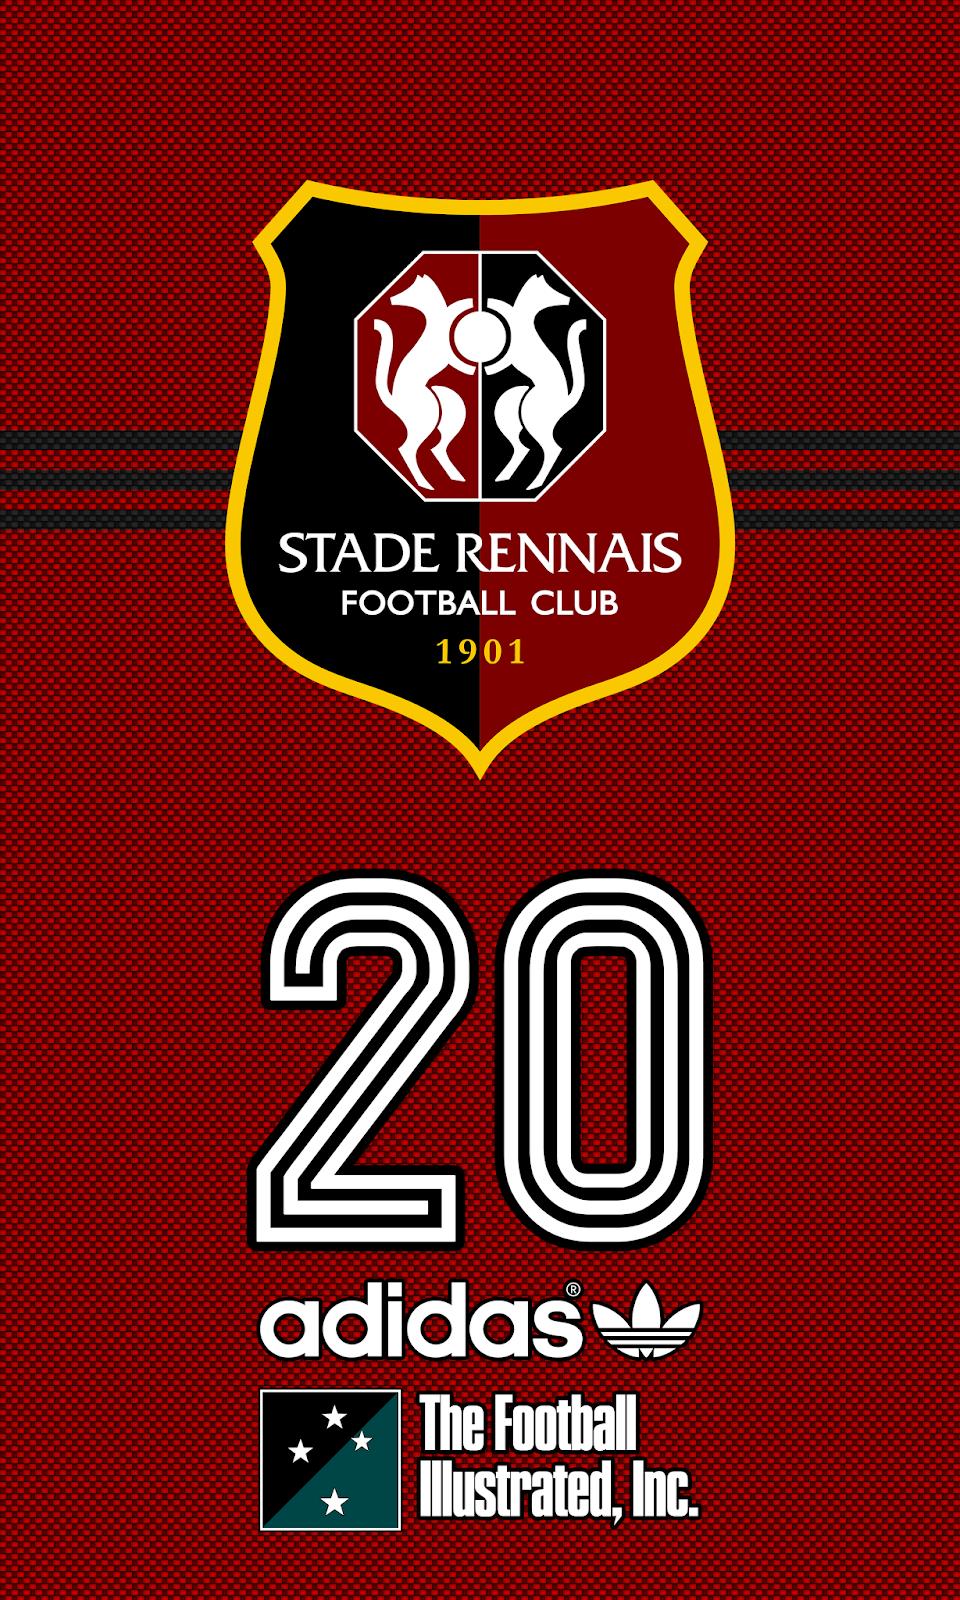 Stade Rennais Of France Wallpaper Stade Rennais Stade Rennes